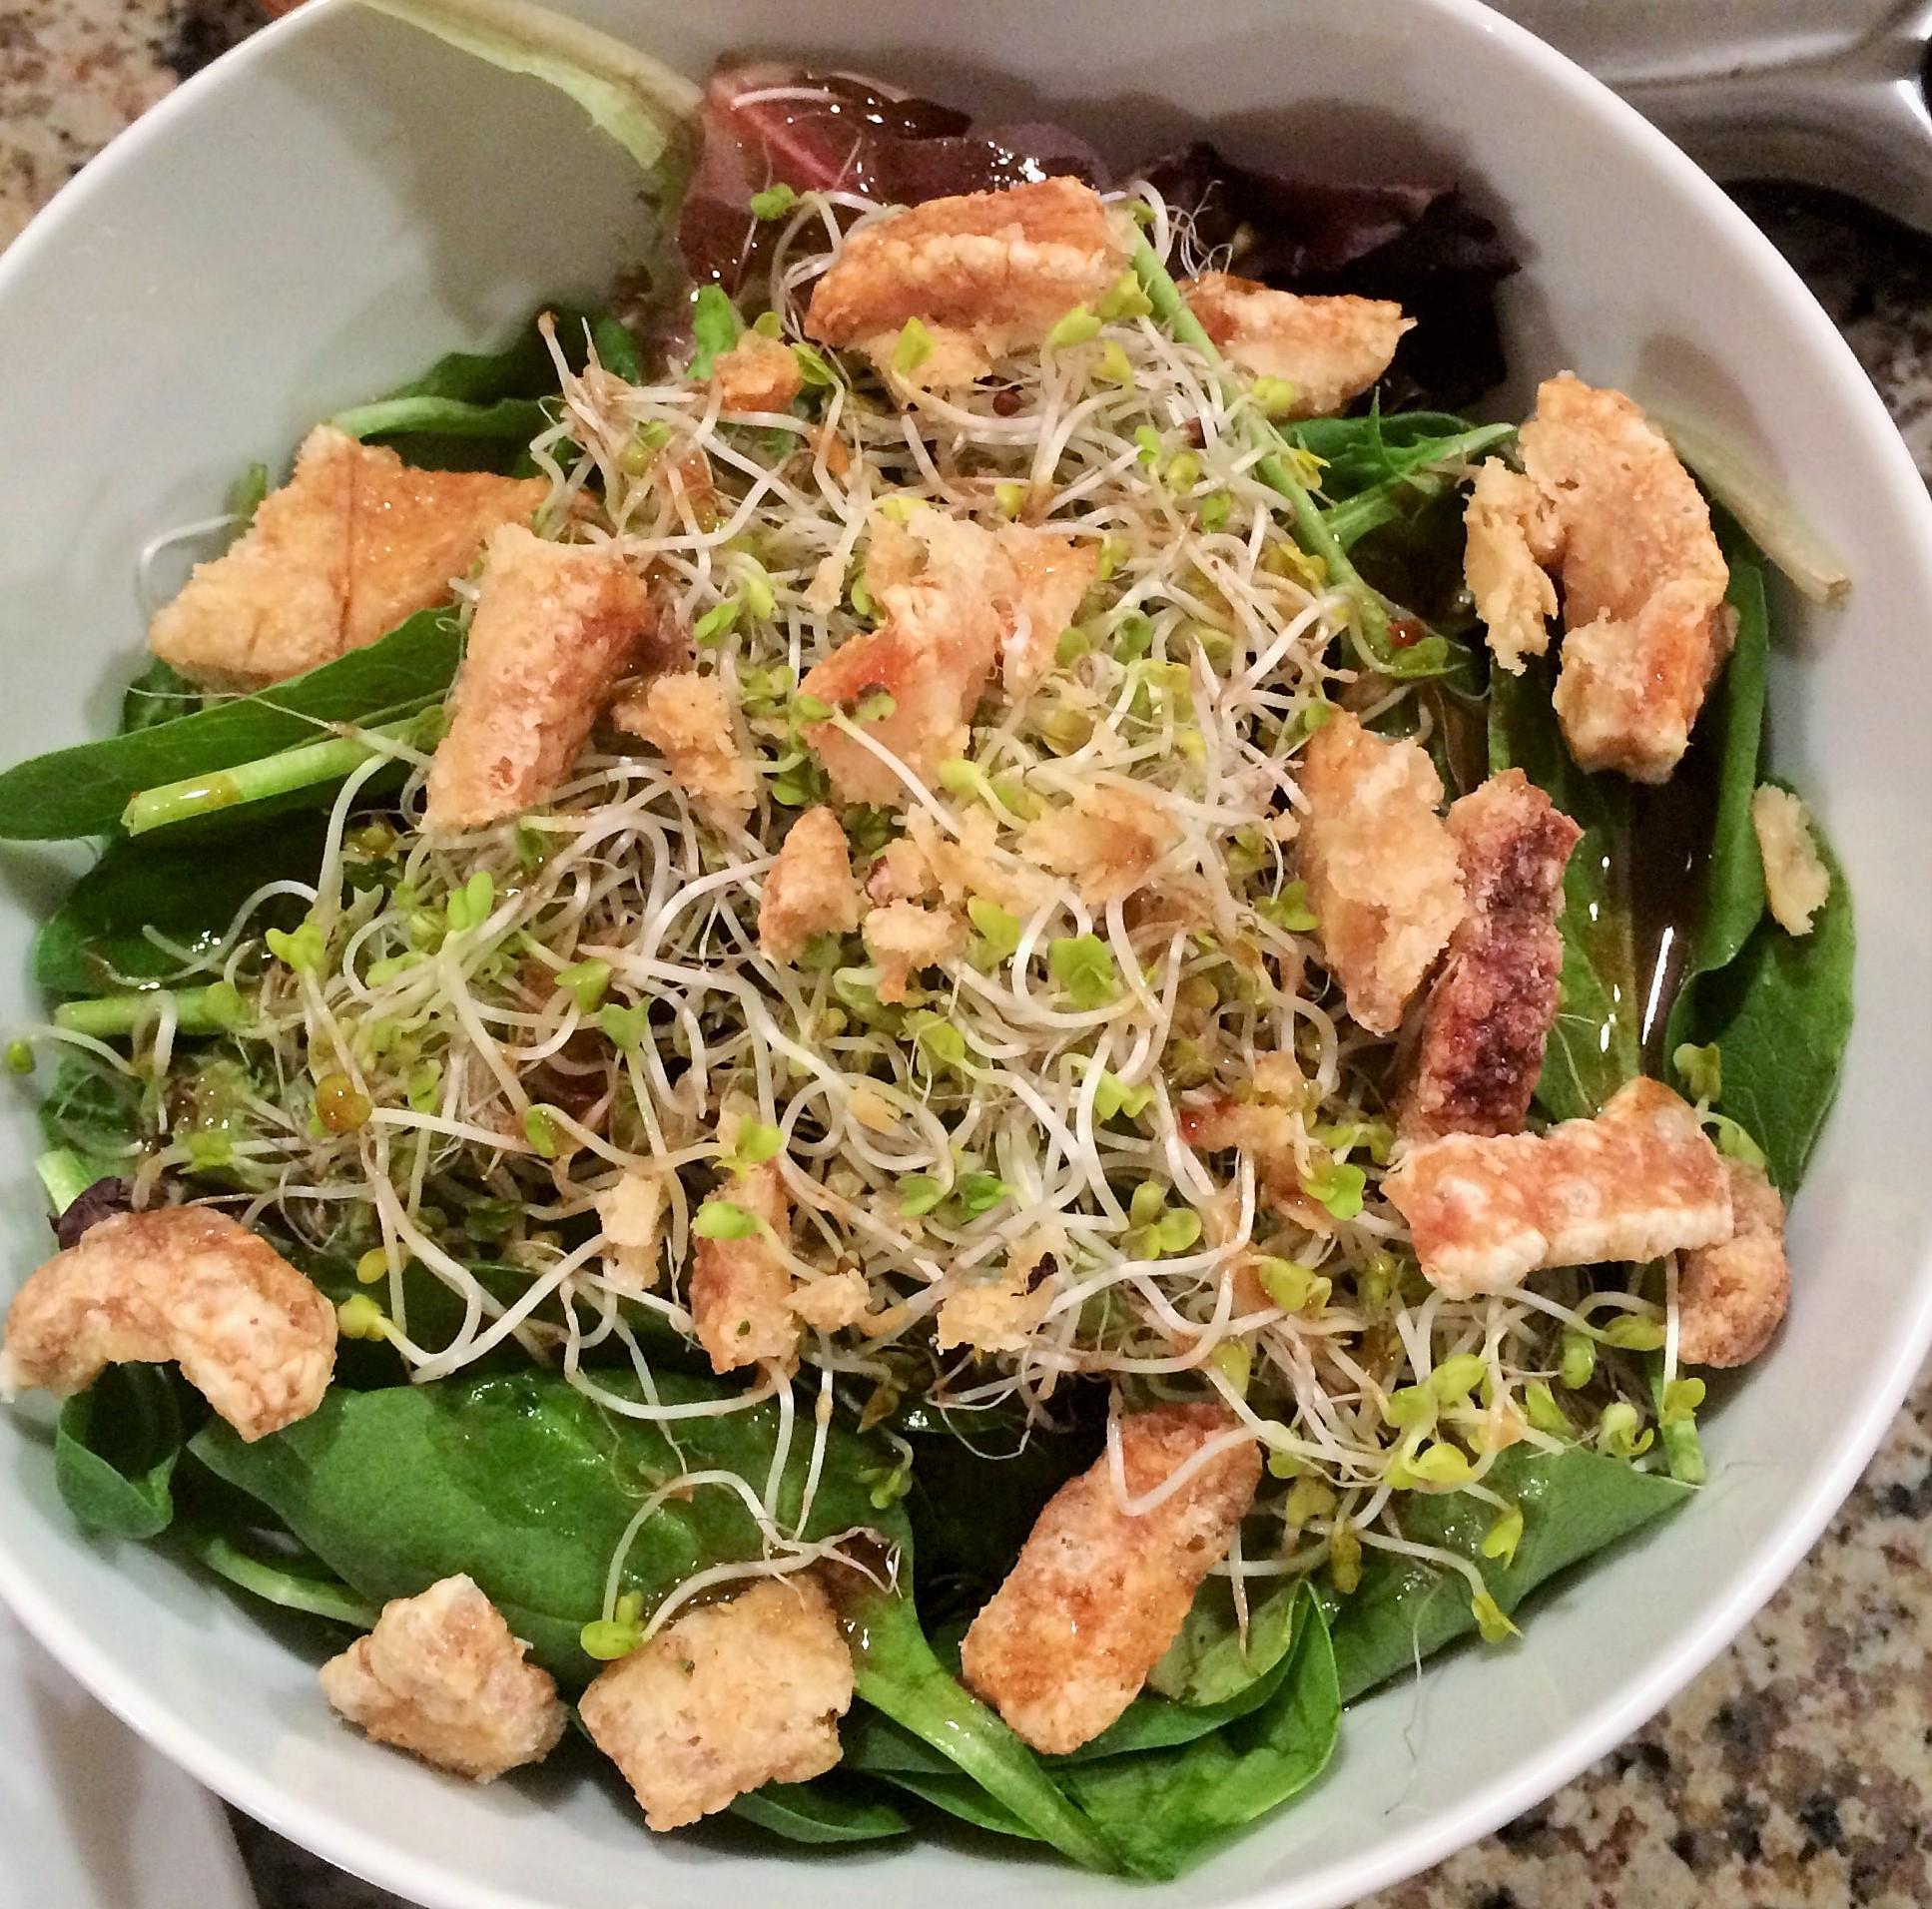 Green Spinach Salad with Chicharron Crisps.